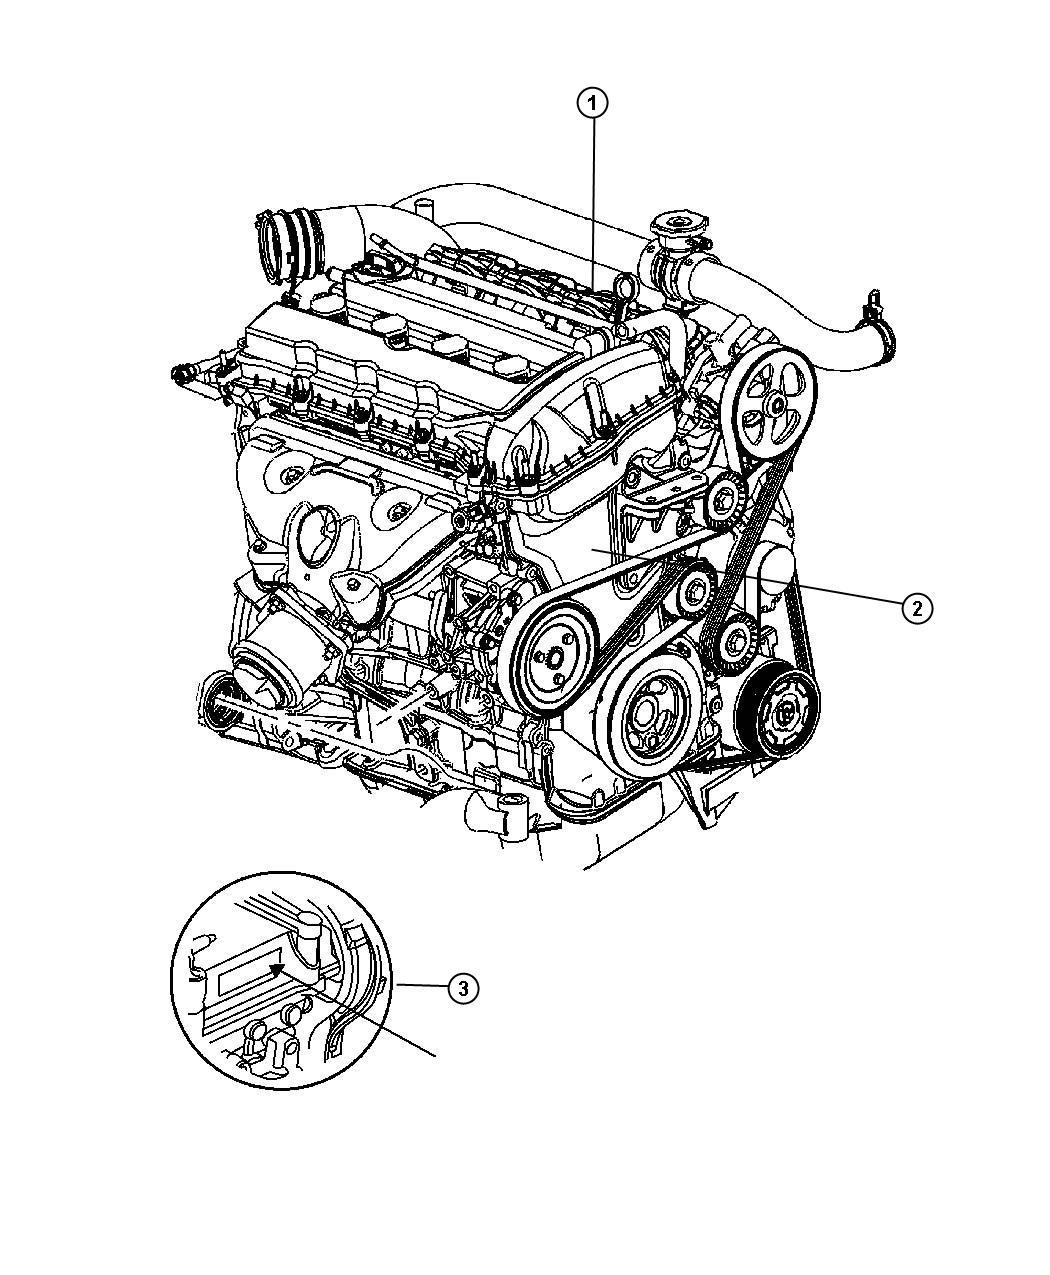 Dodge Caliber Engine Long Block